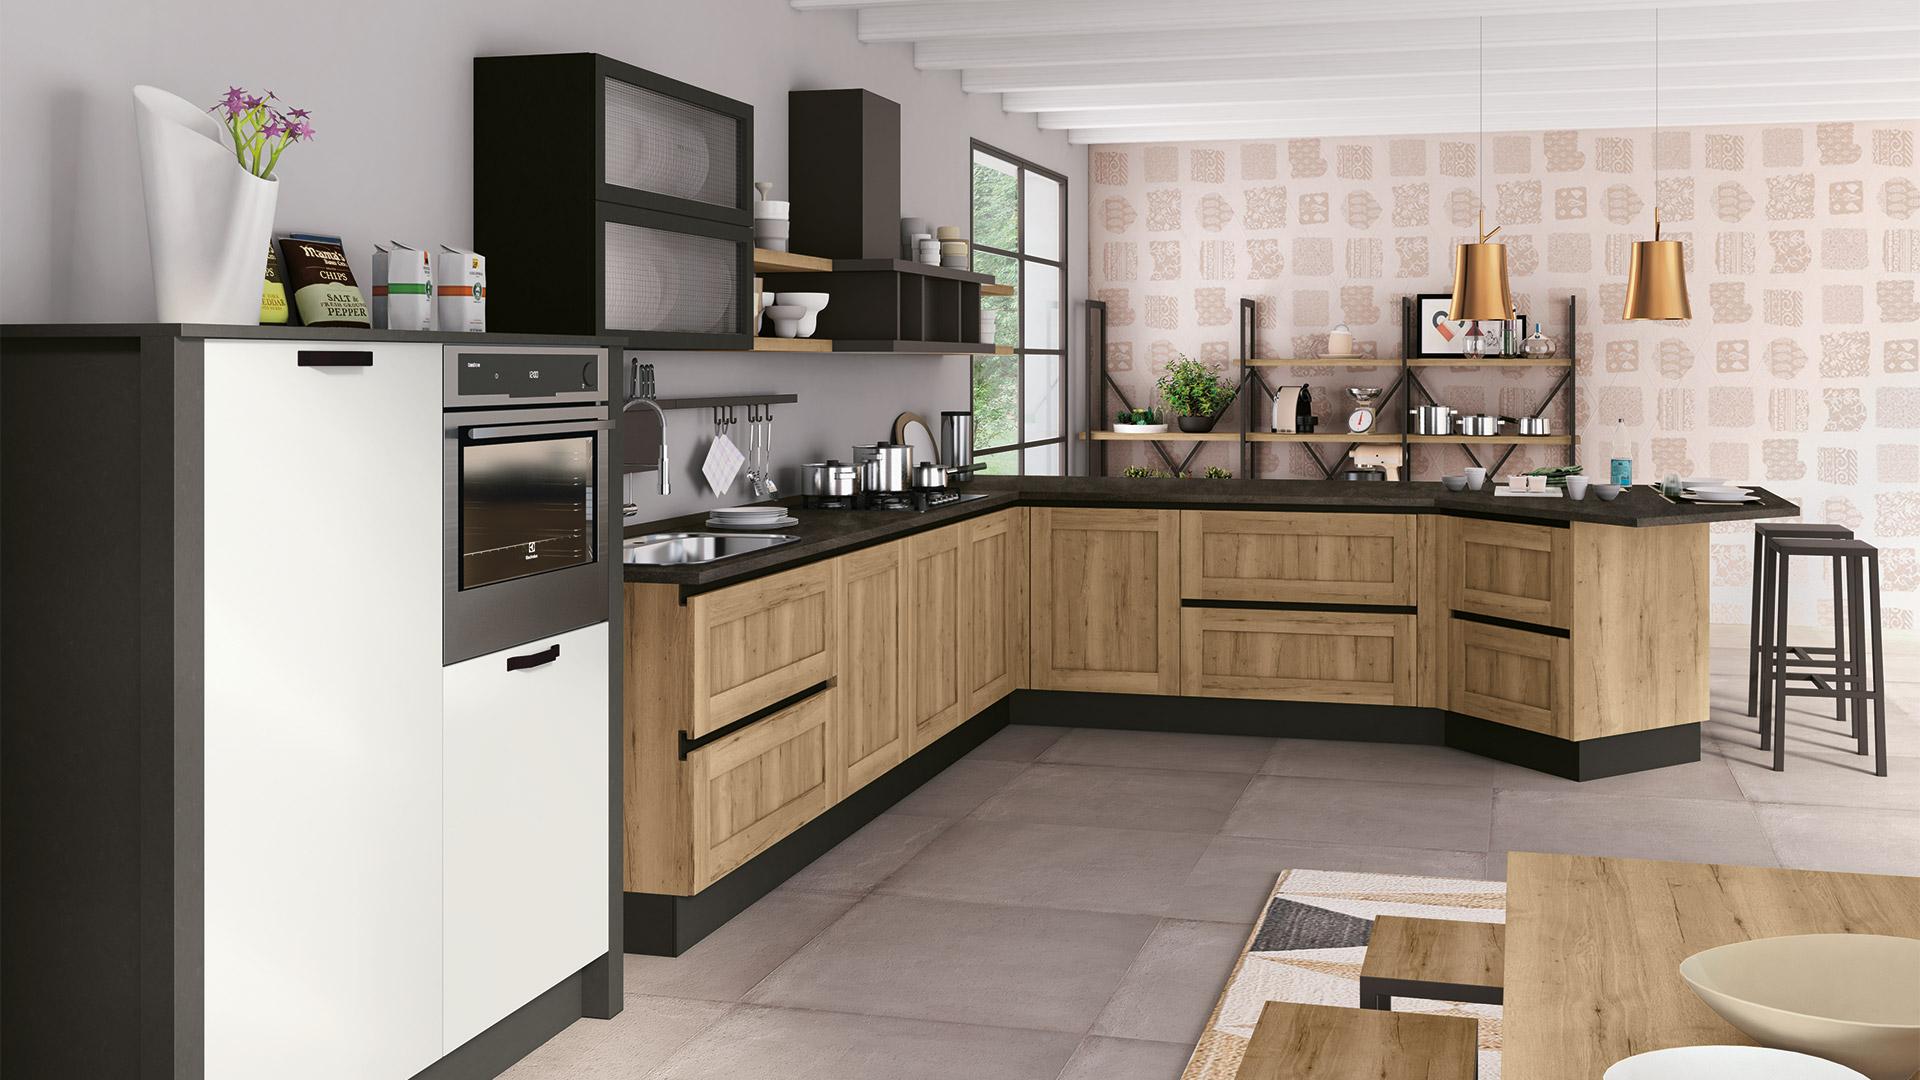 2589_kyra-telaio-cucina-ambientata-14